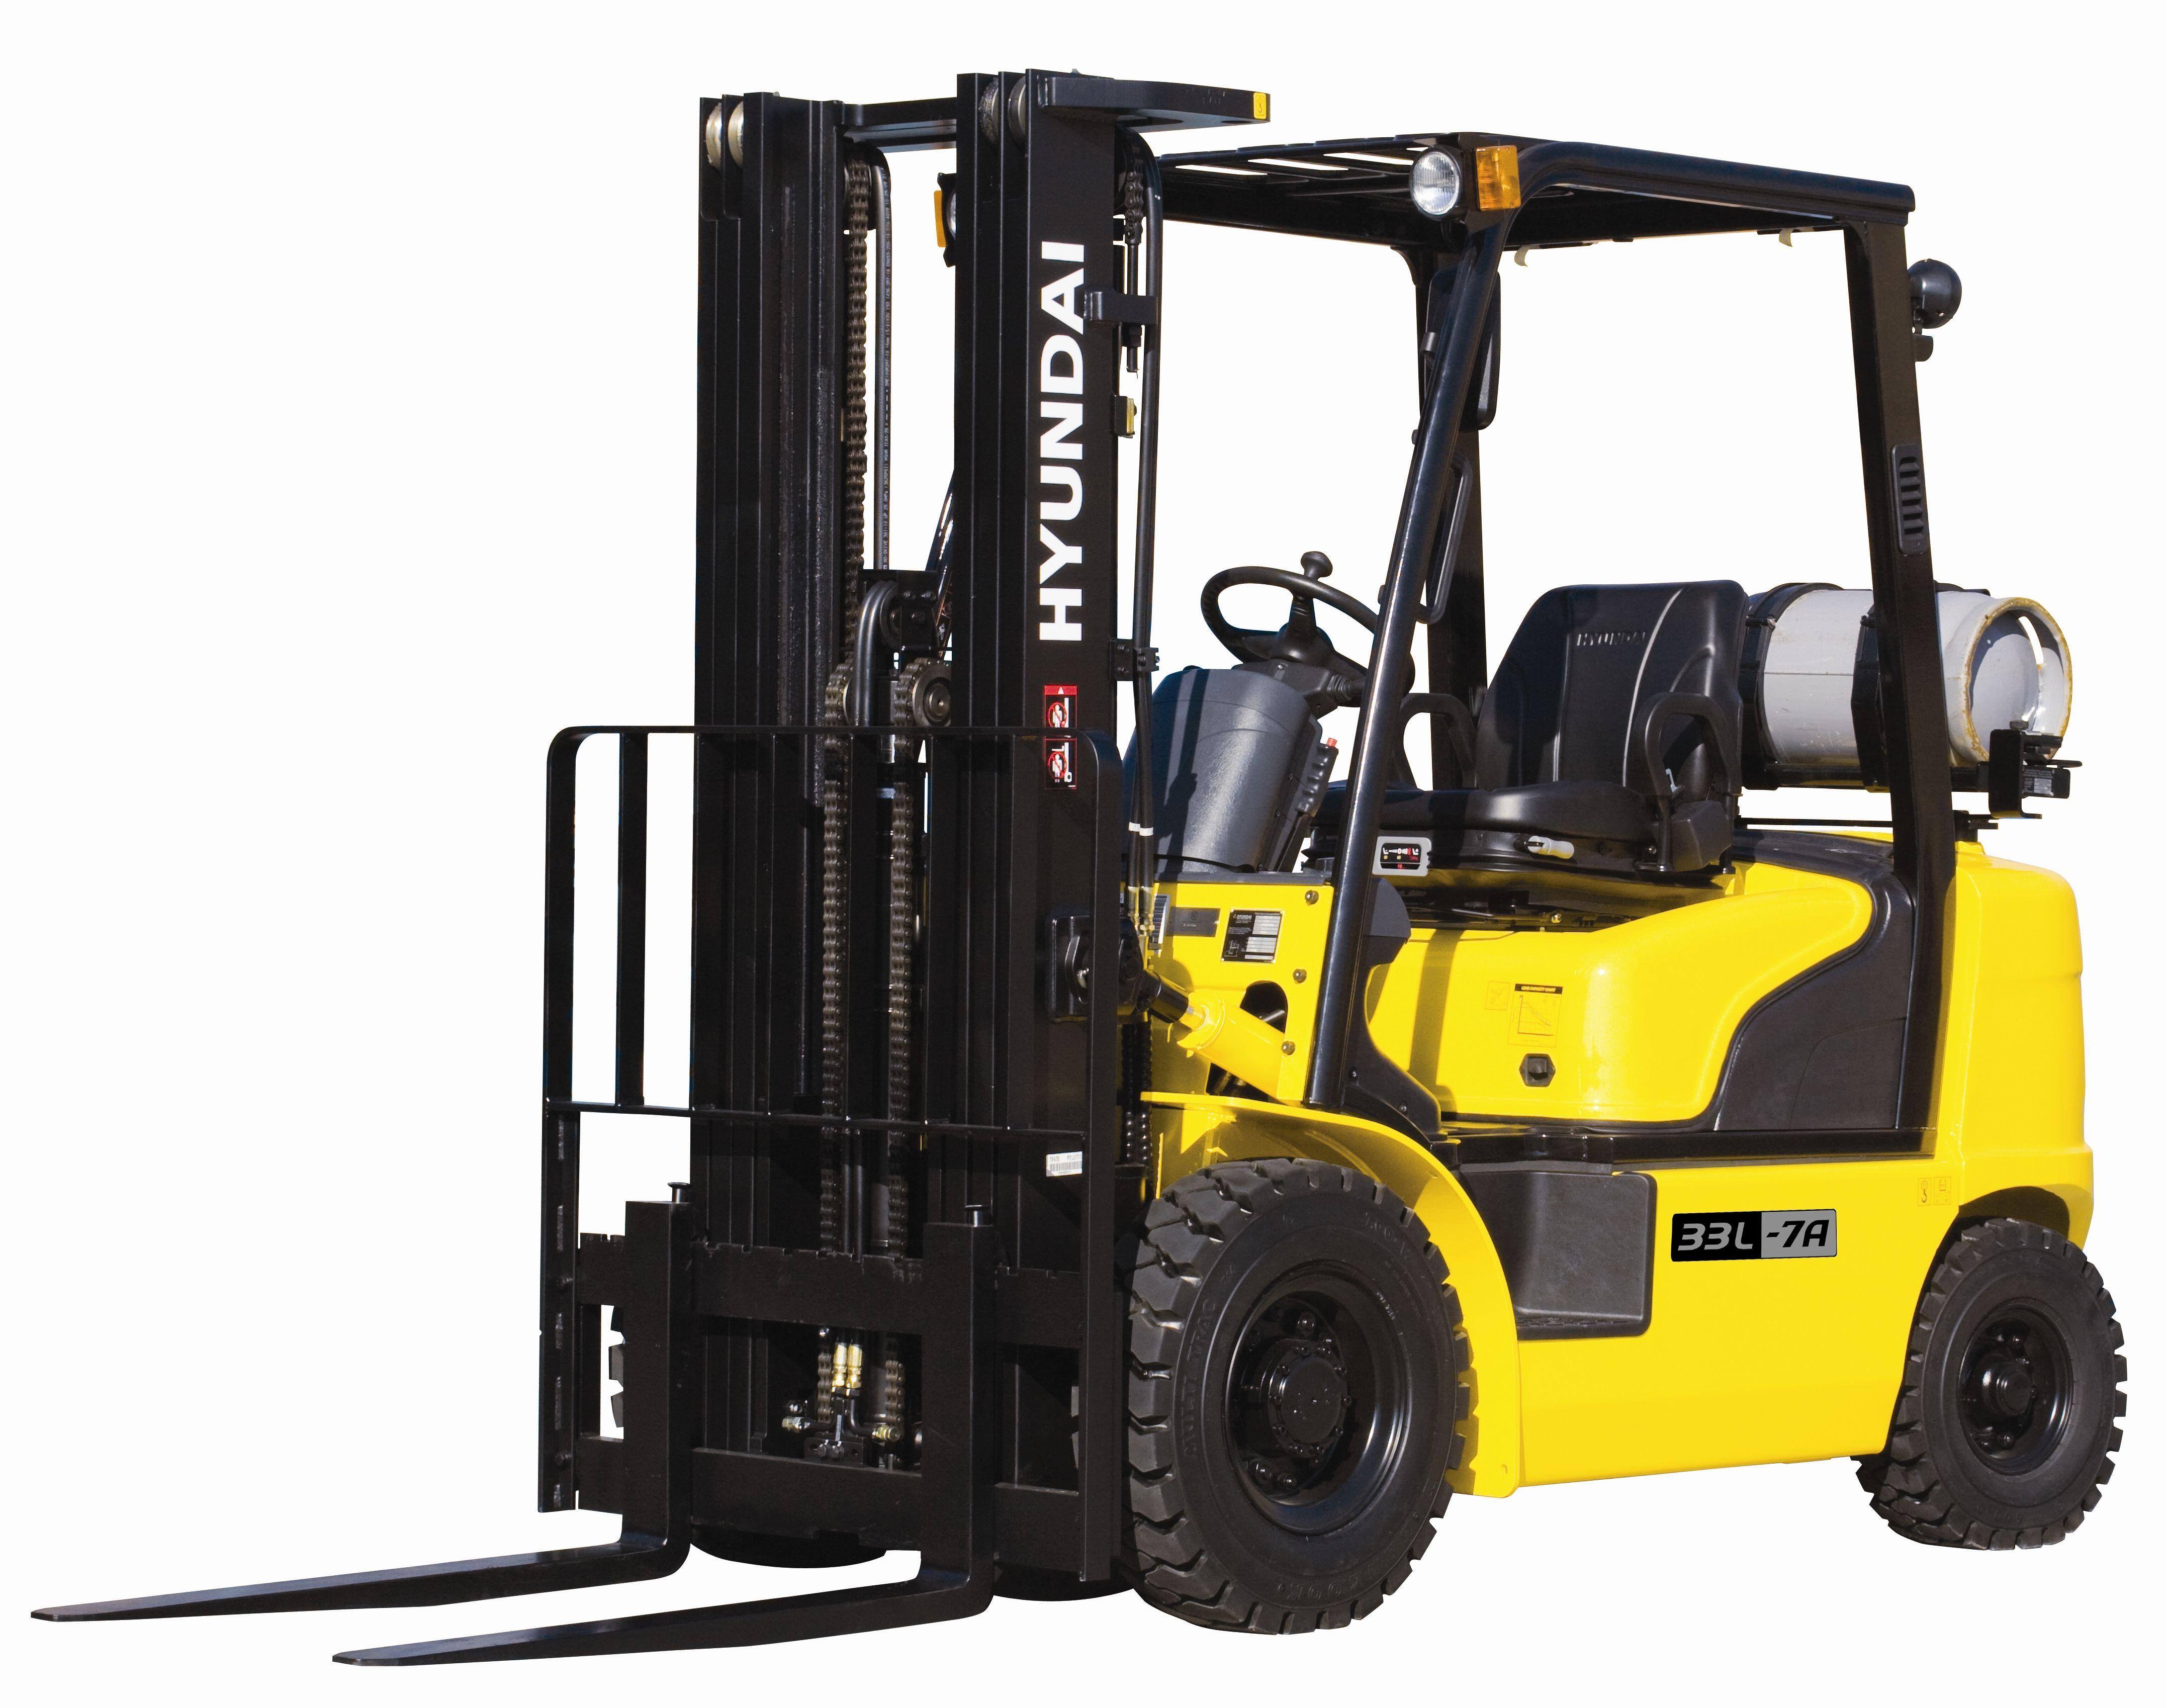 [Object 5] Hyundai Forklift Hyundai, Forklift, Buy used